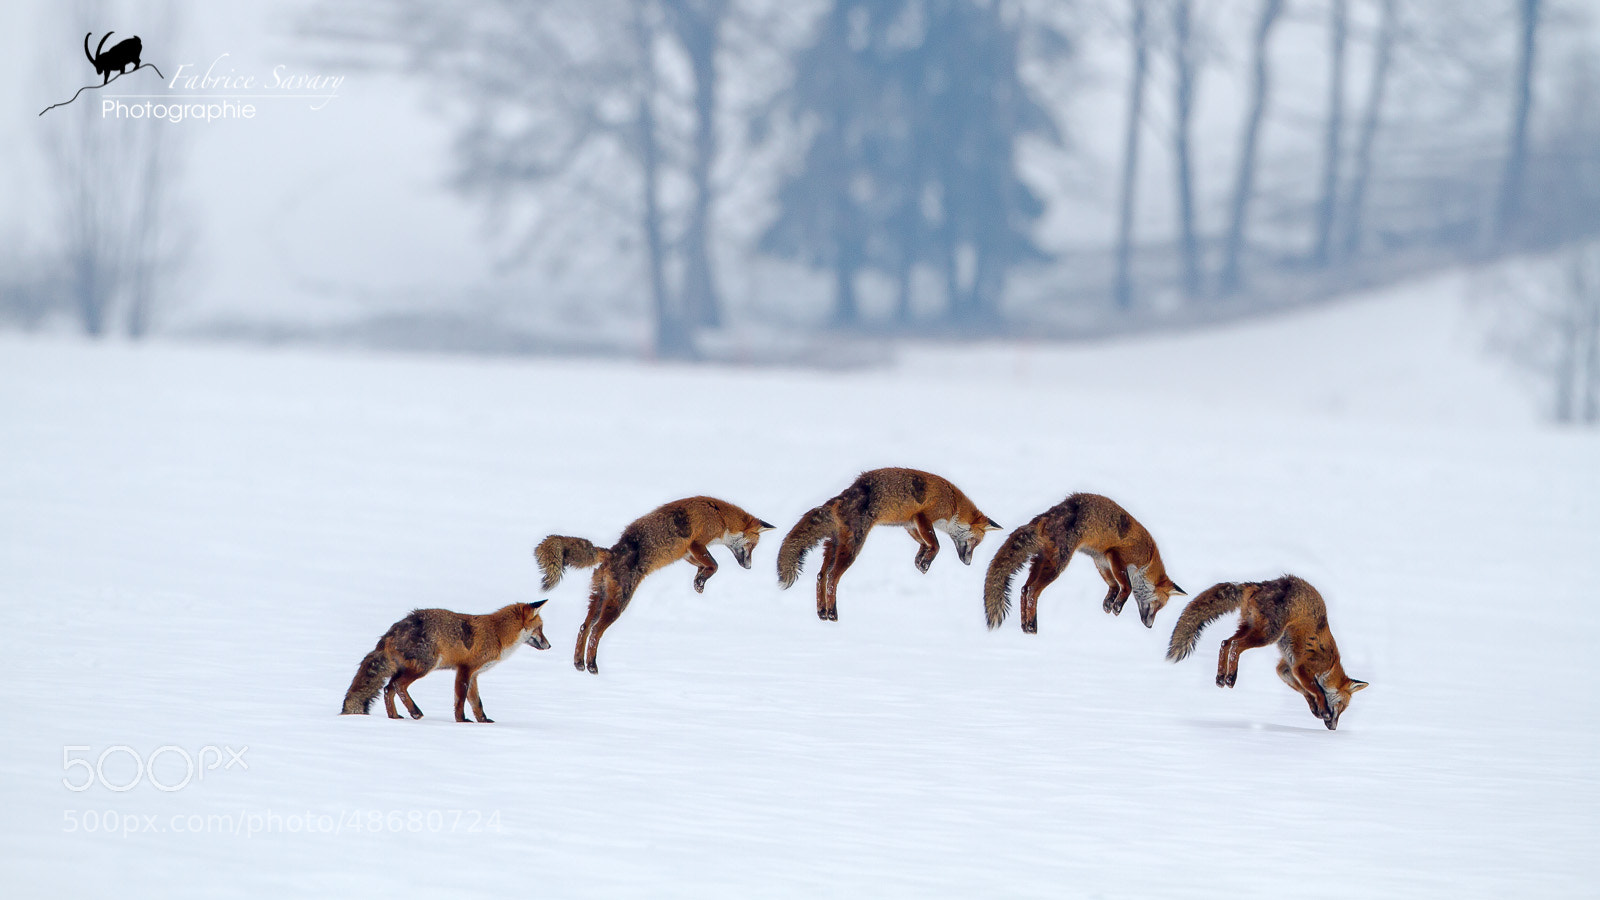 Photograph Fox jump by Fabrice Savary  on 500px